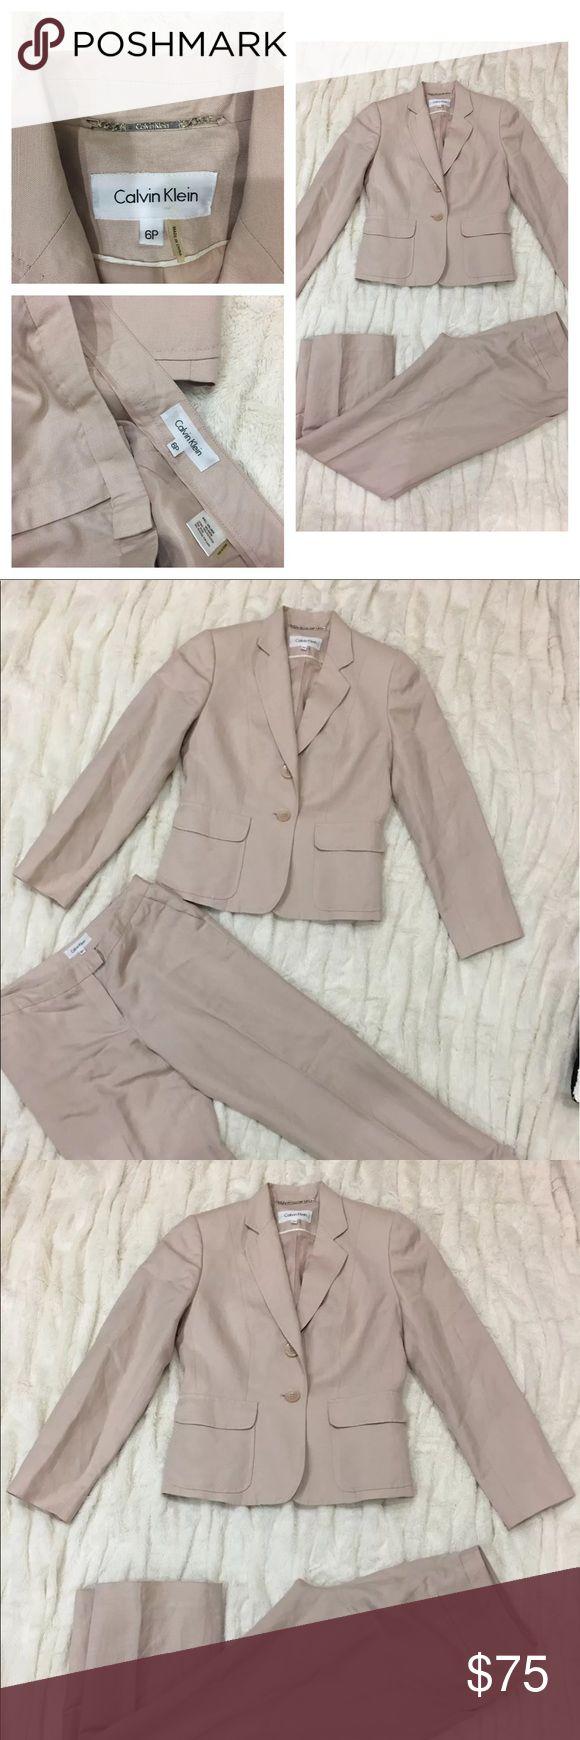 Calvin Klein Women's Blazer Pants Suit $350 Pastel Calvin Klein Women's Blazer Pants Suit $350 Pastel Color Career Work Office Wear Calvin Klein Jackets & Coats Blazers